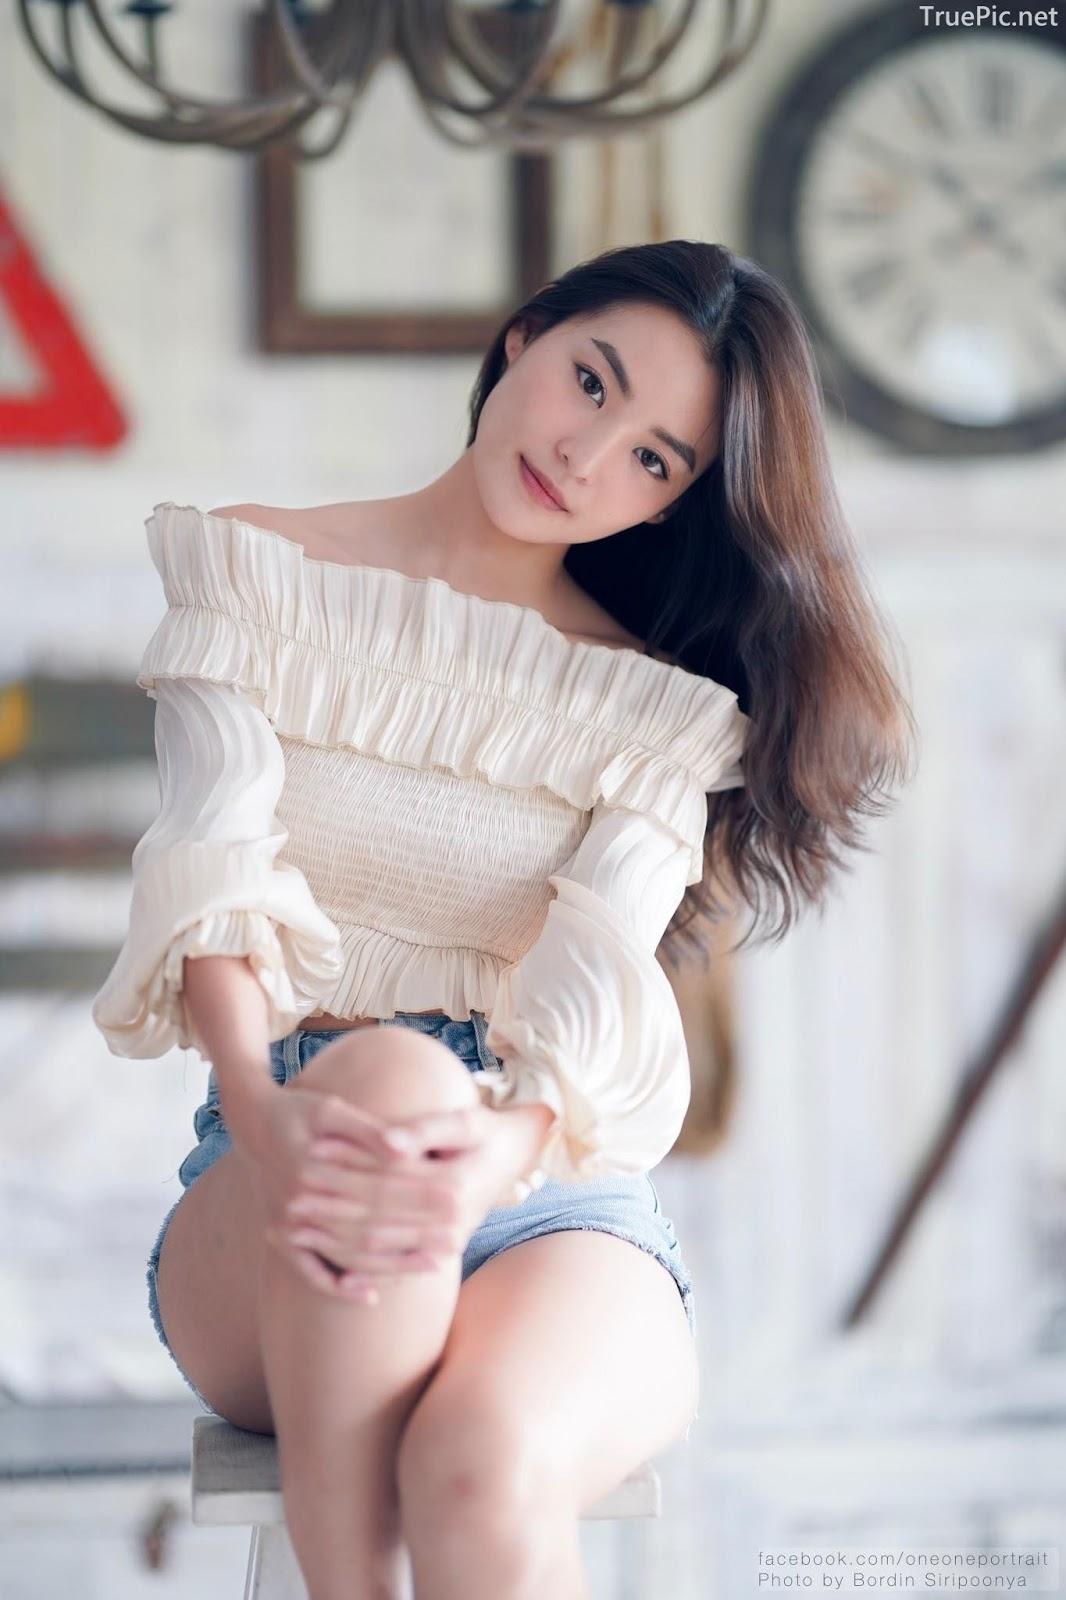 Beauty Thailand Kapook Phatchara vs Photo album Love you 3000 - Picture 4